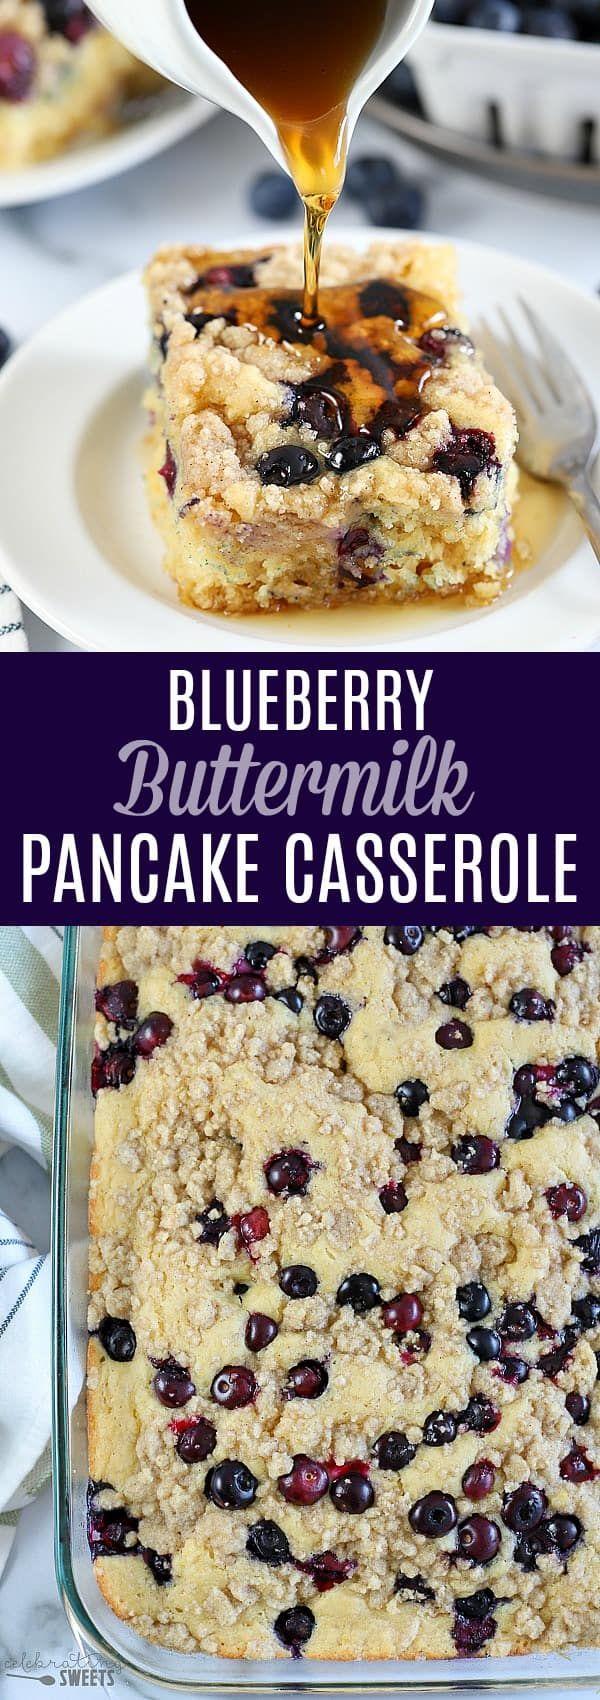 Blueberry Buttermilk Pancake Casserole - Celebrating Sweets